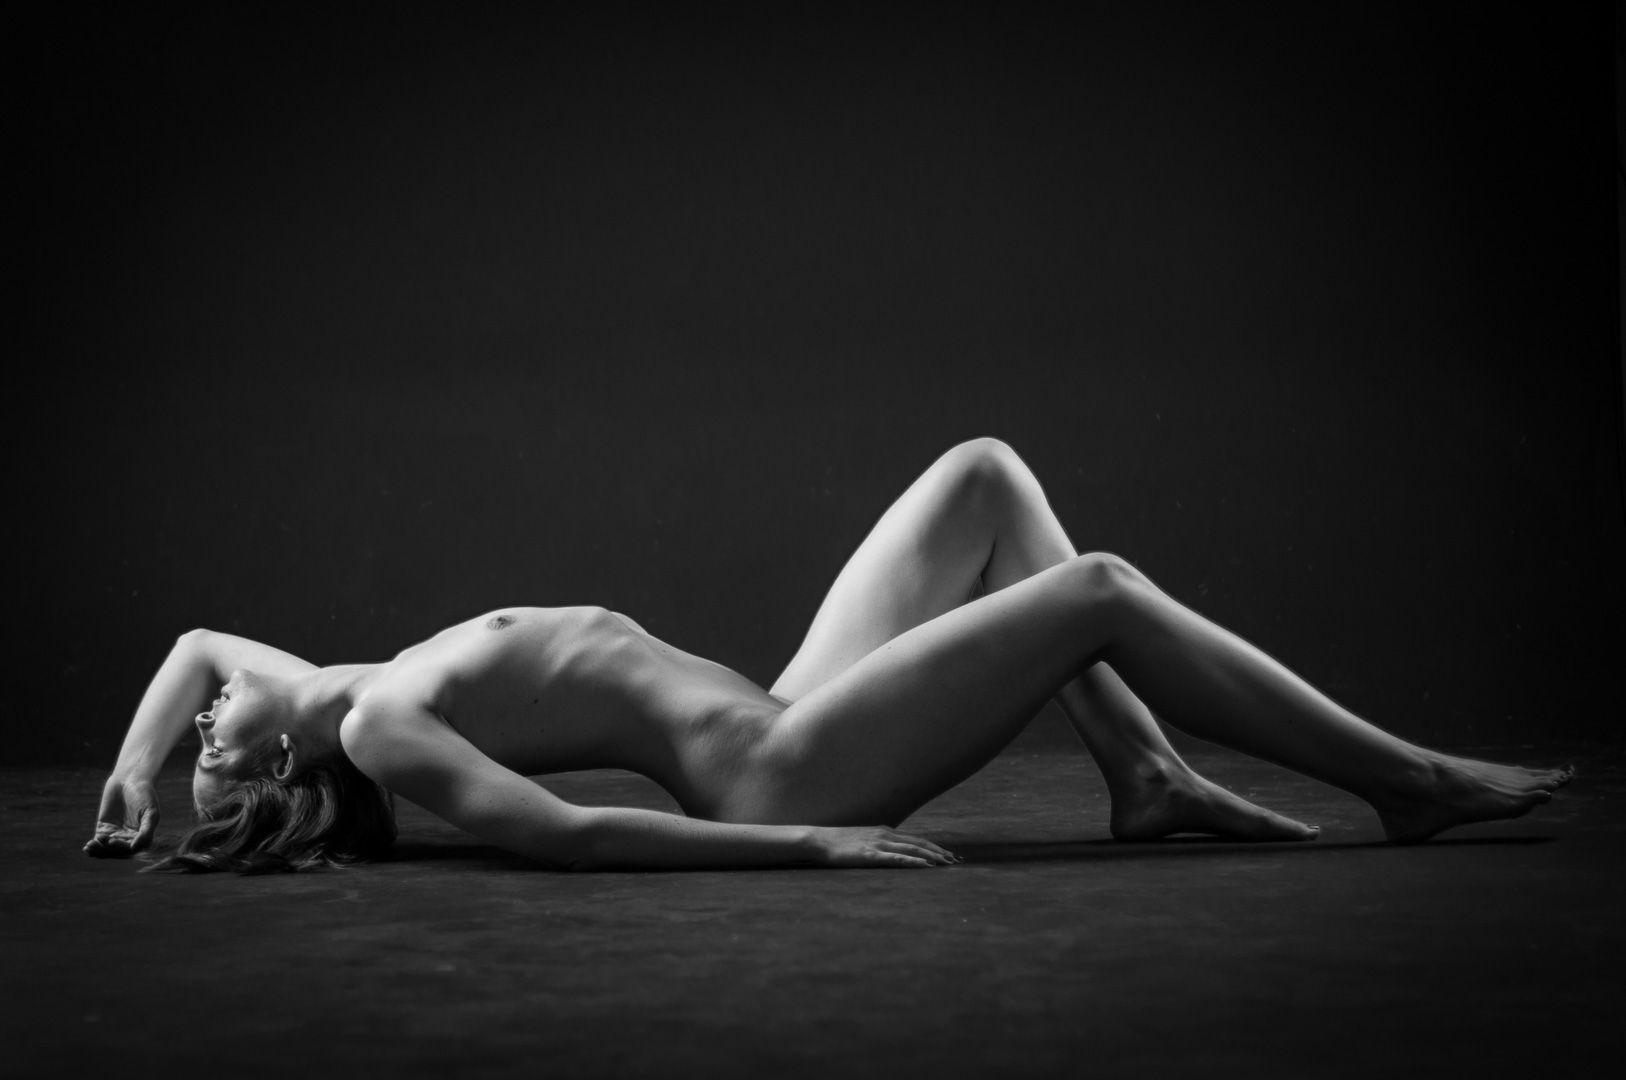 Creative art nude photography